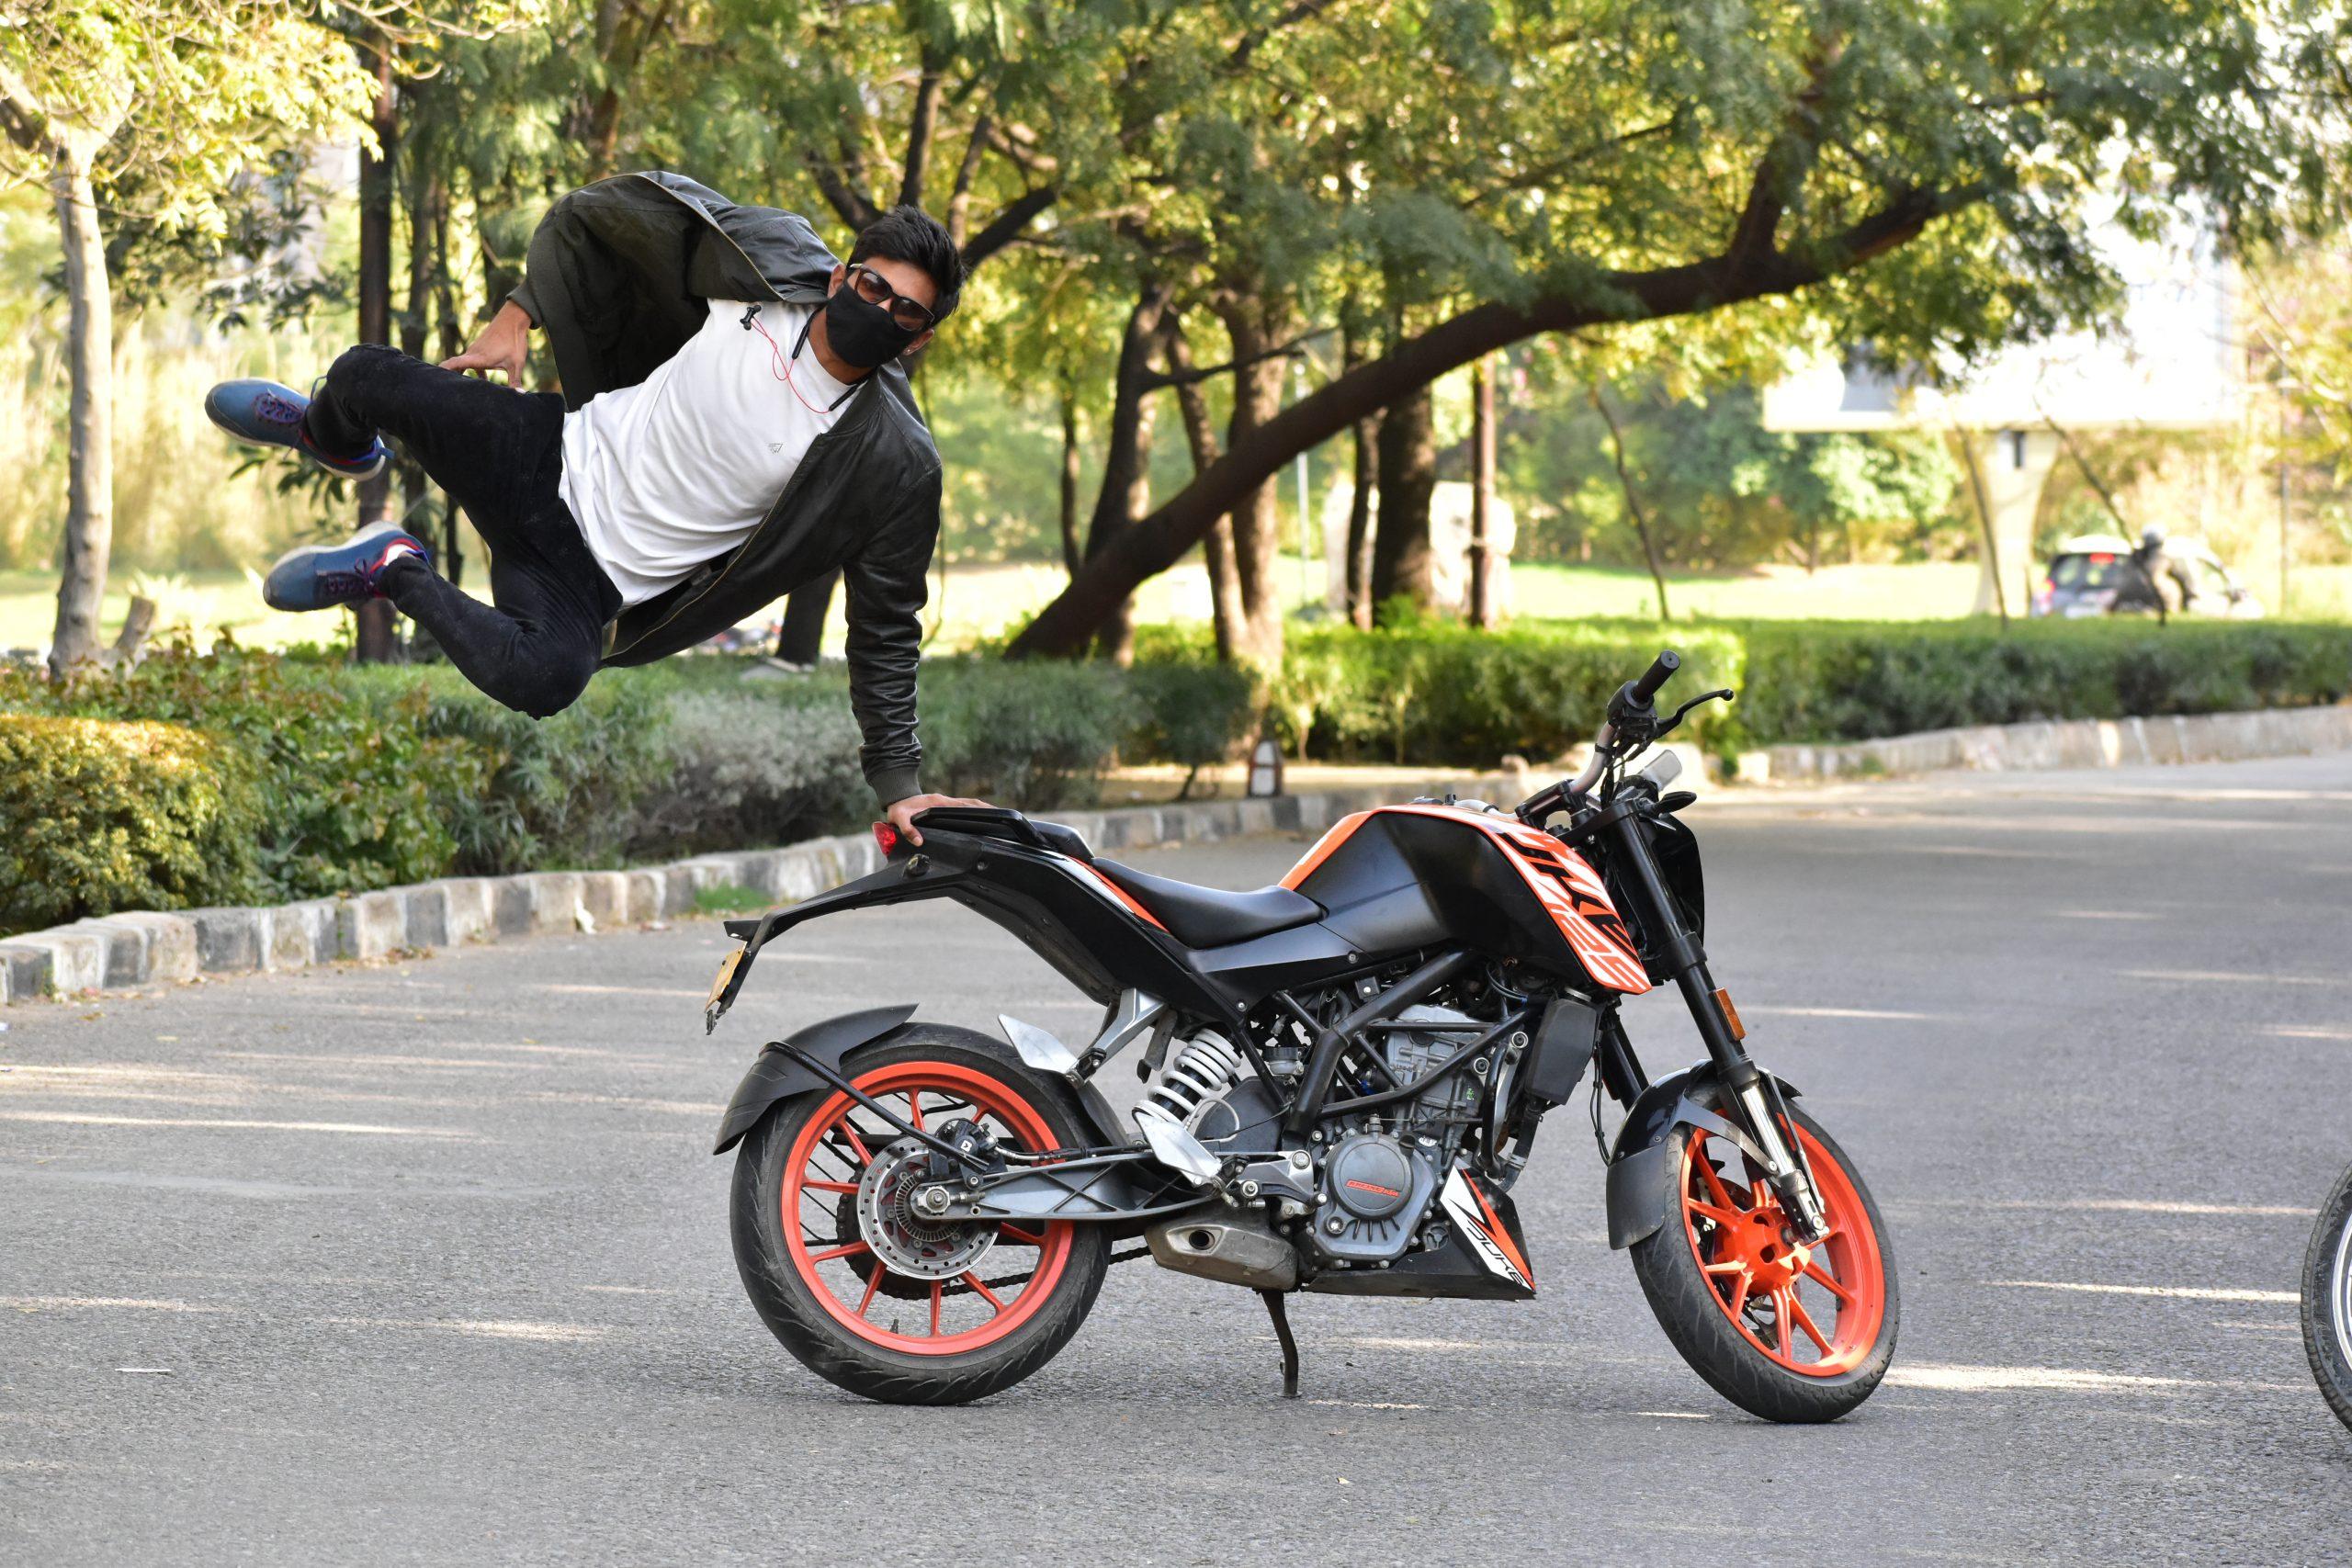 A boy jumping around a bike